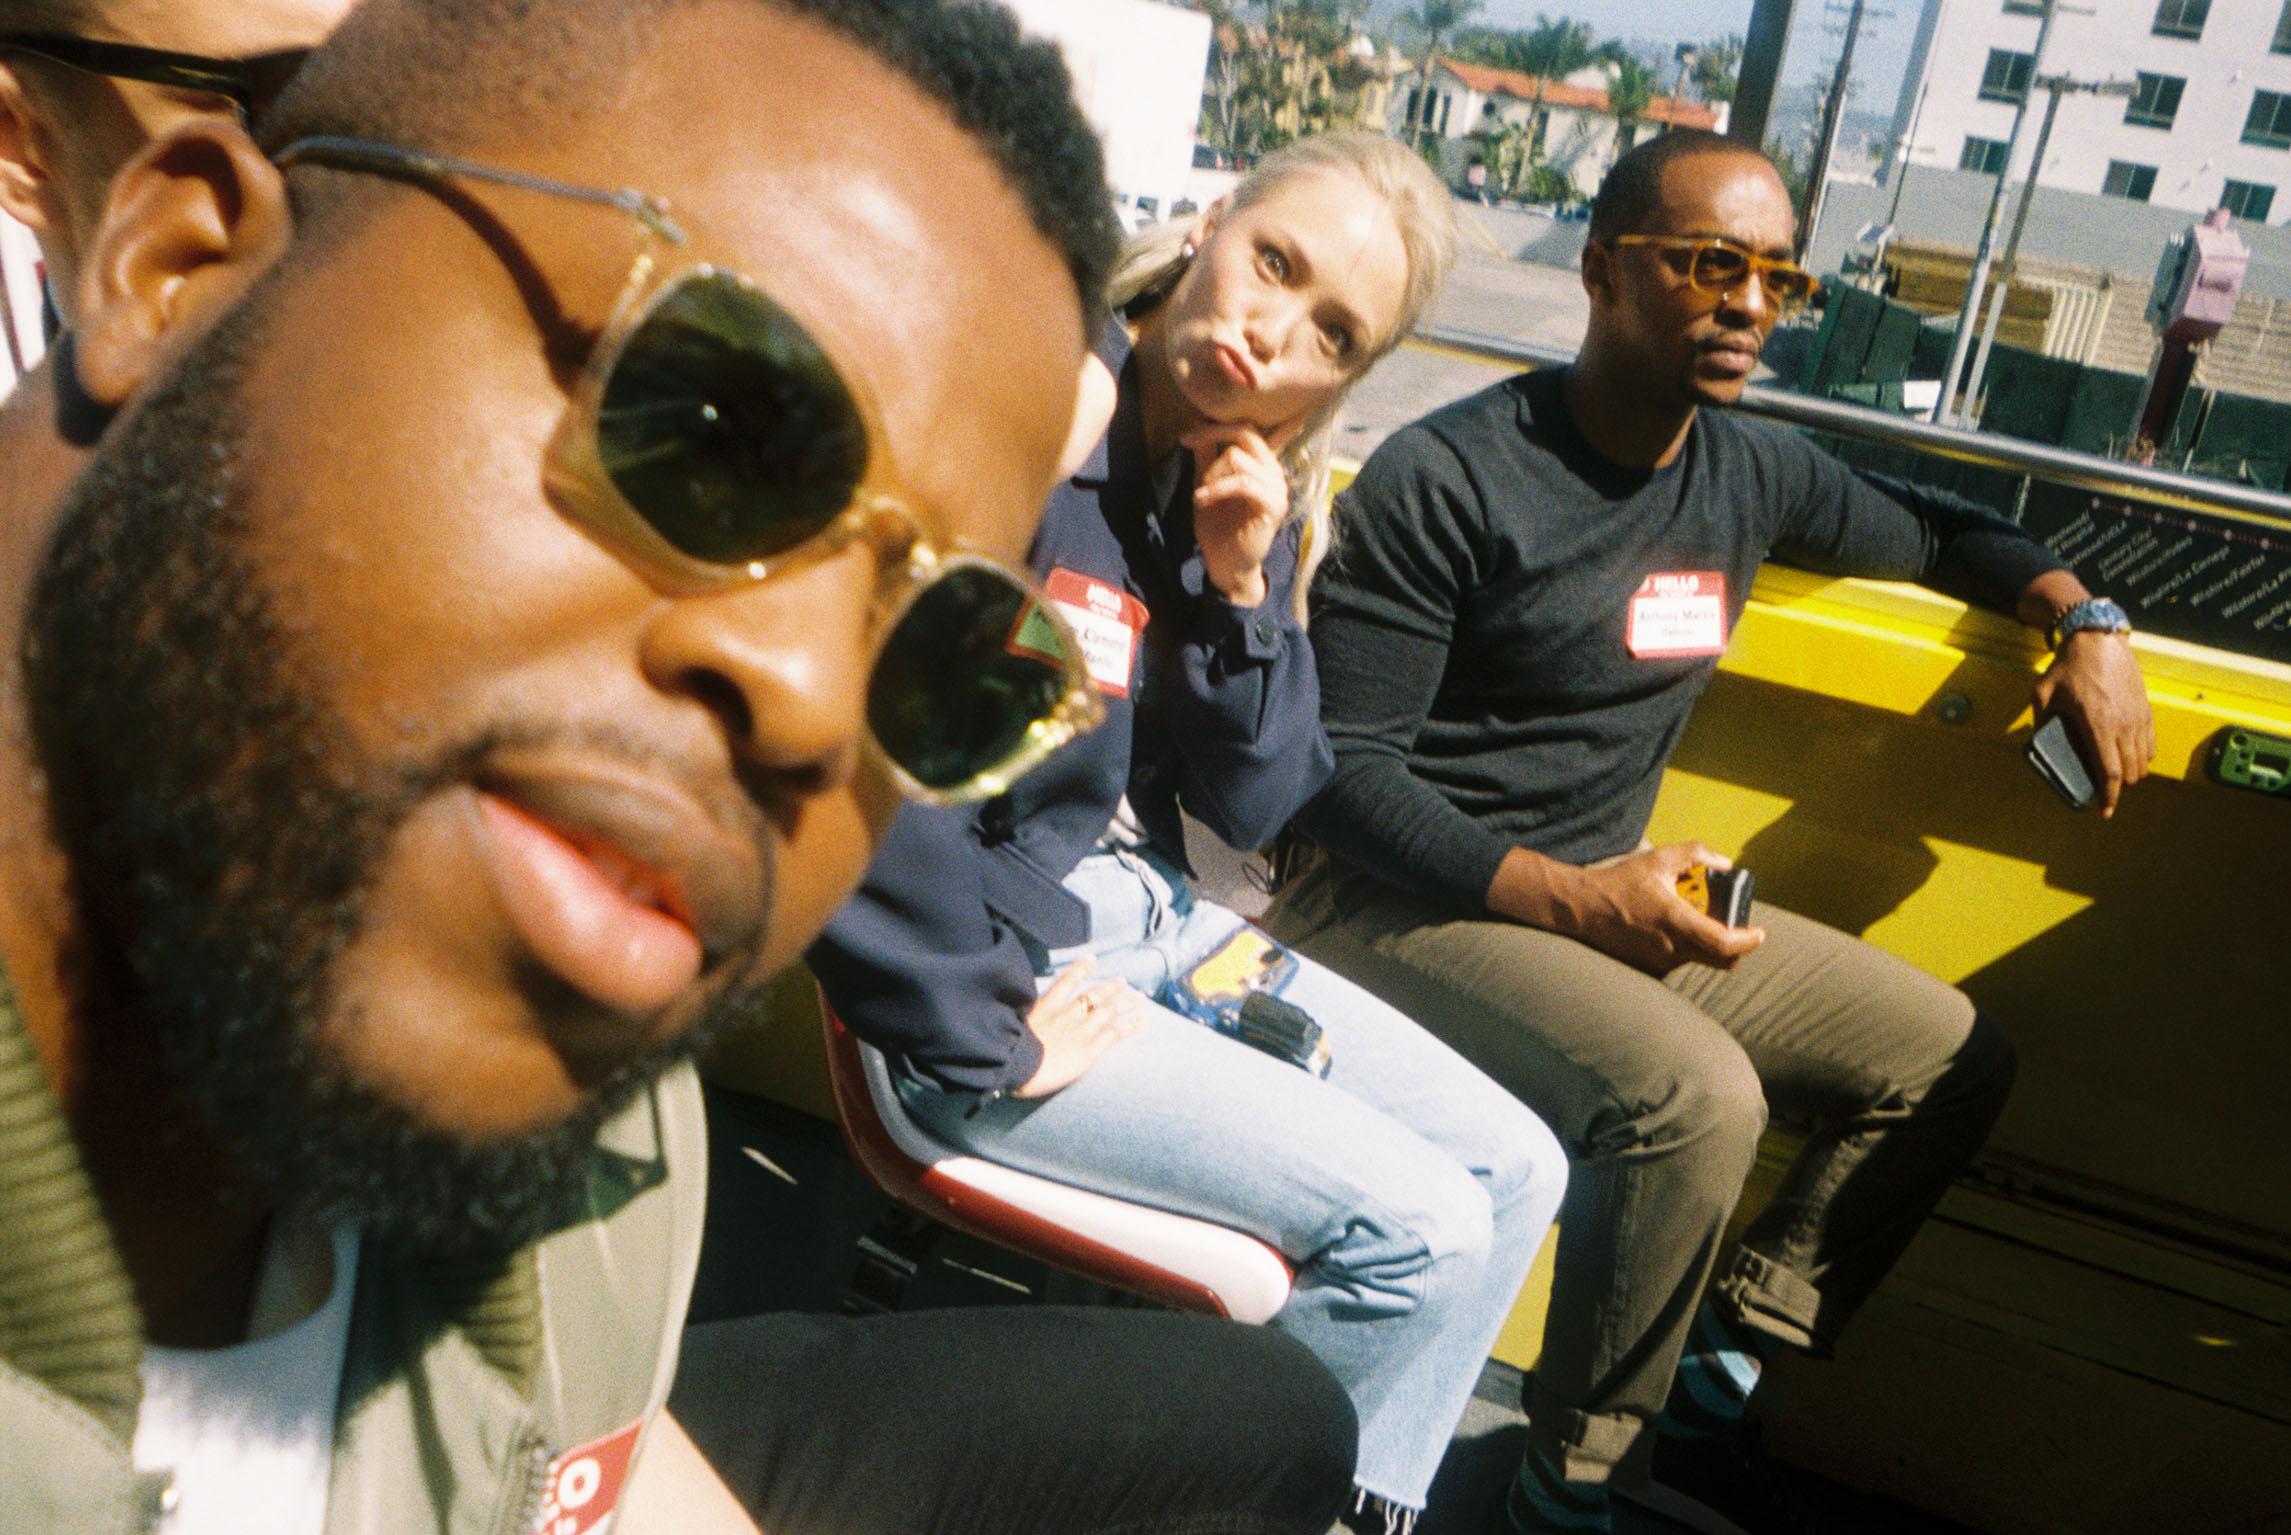 Winston Duke, Pom Klementieff and Anthony Mackie